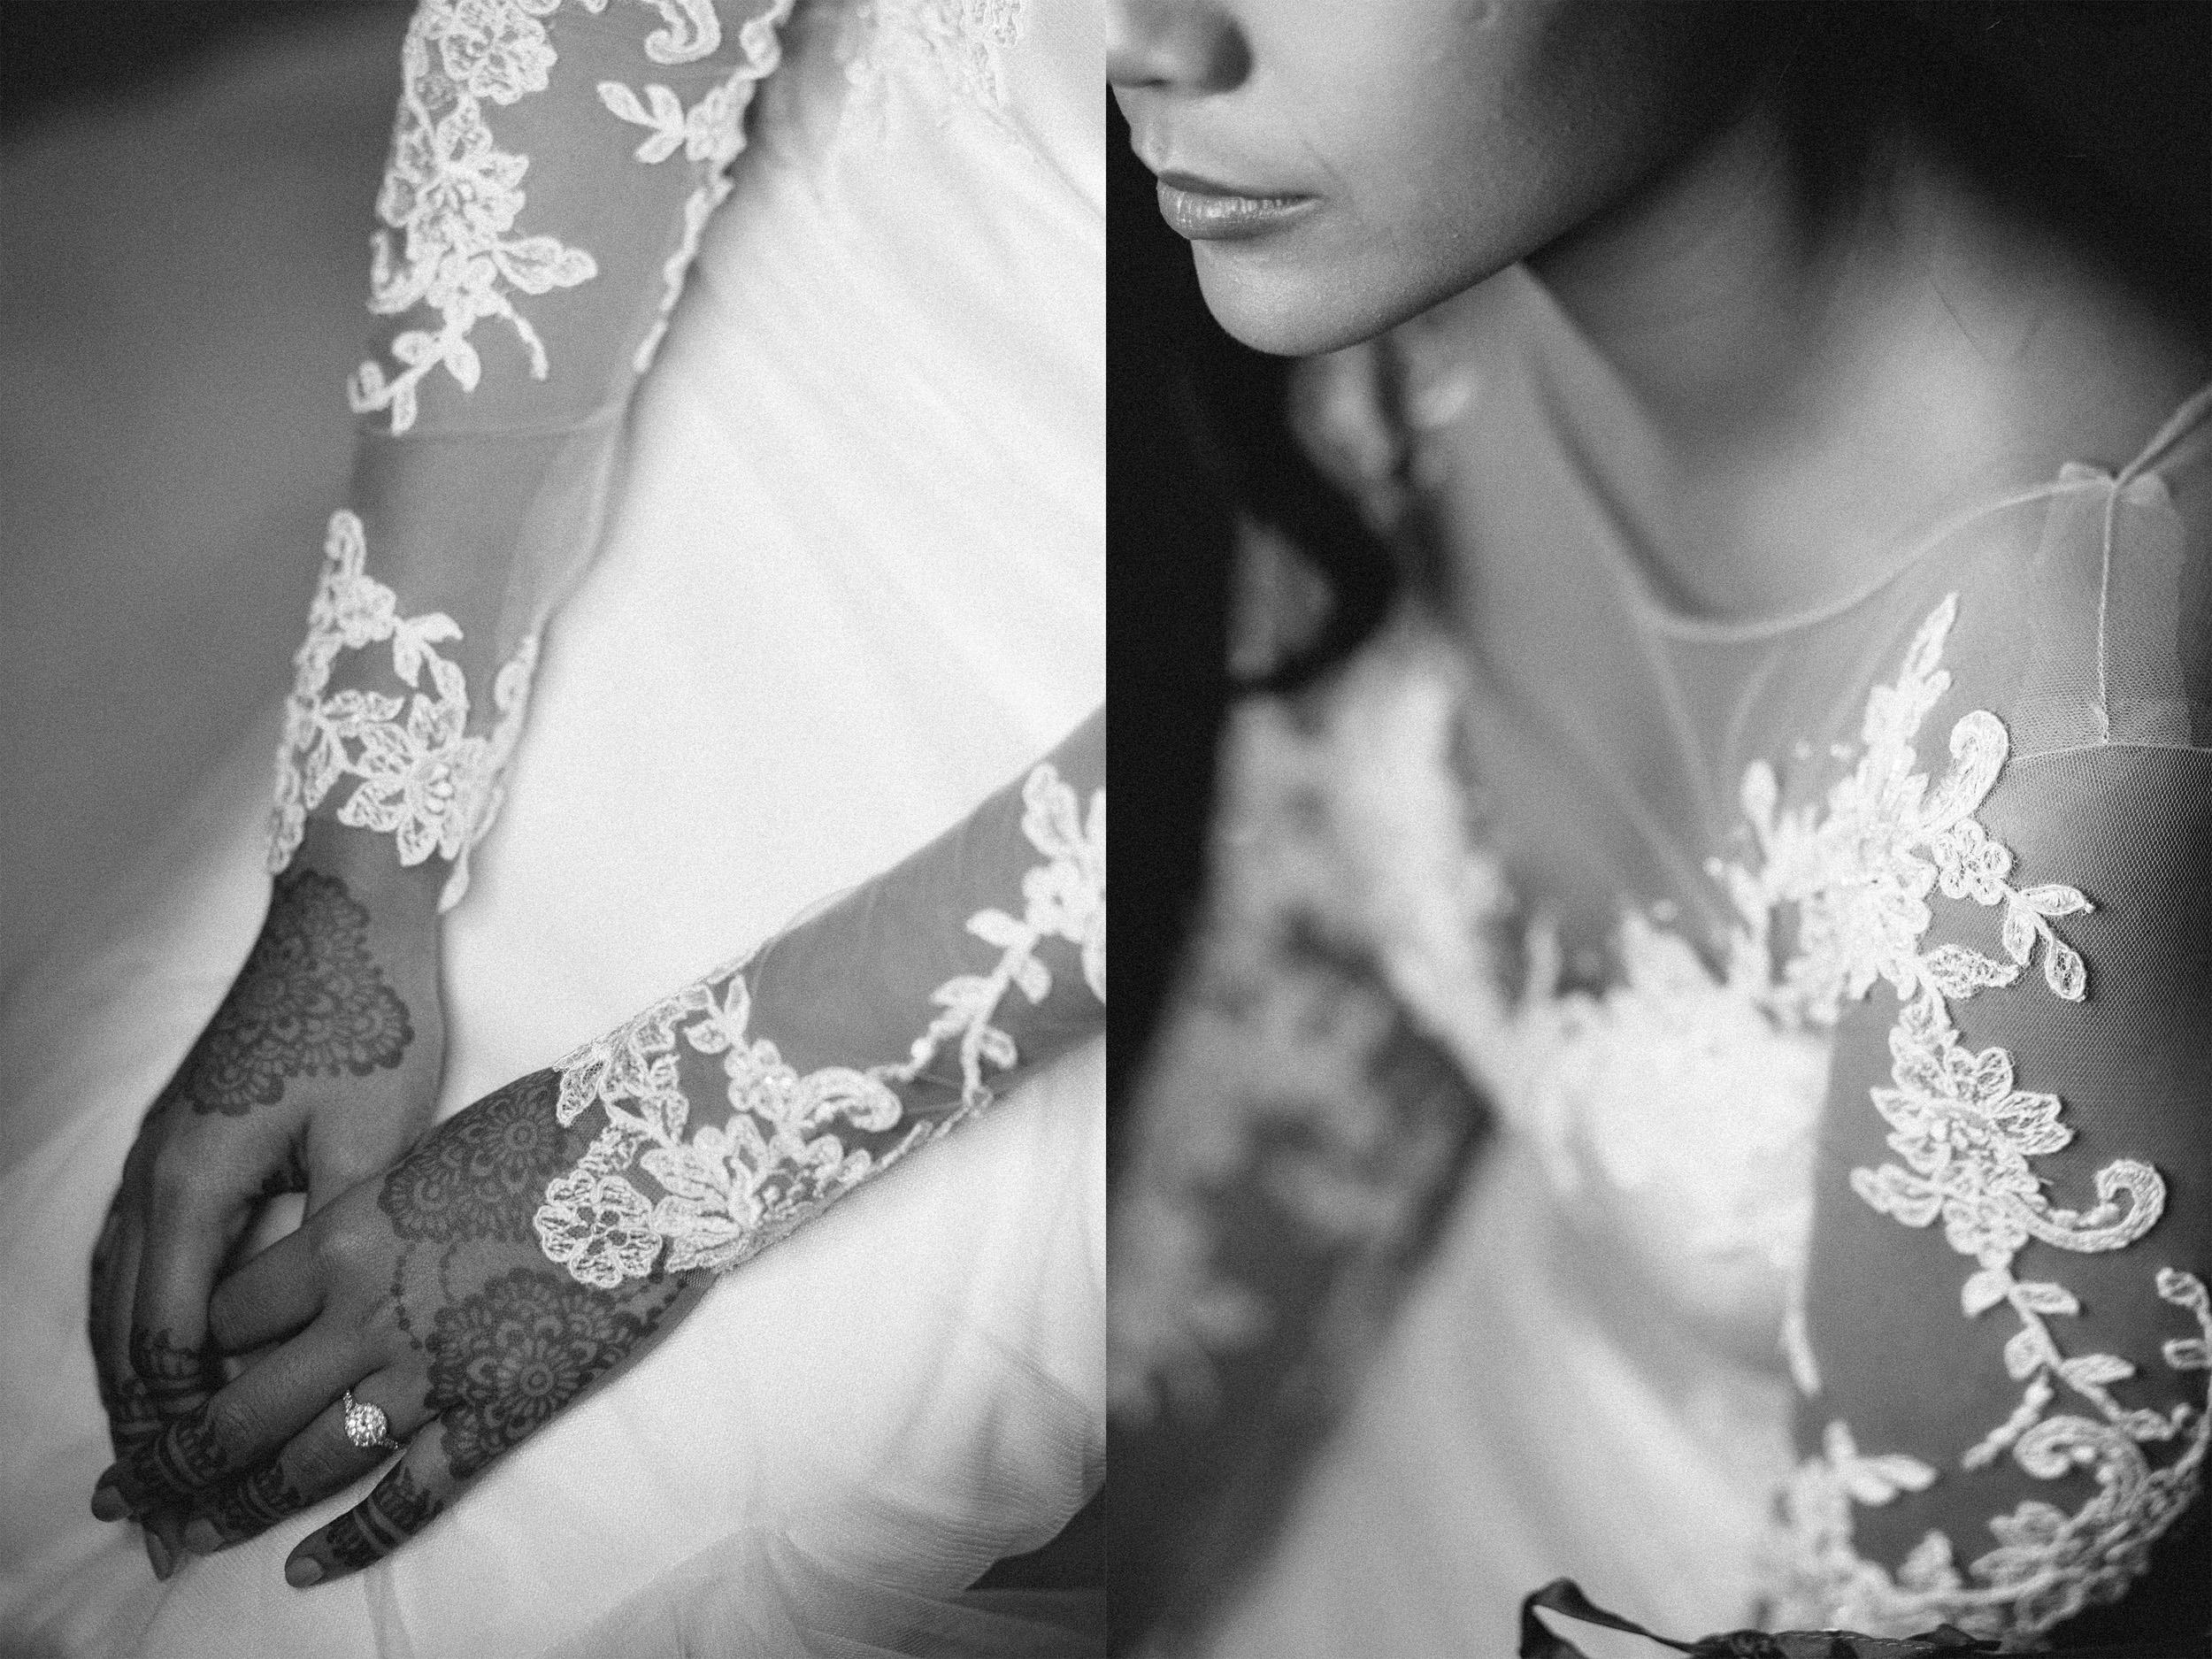 singapore-wedding-photographer-photography-wmt2017-026.jpg